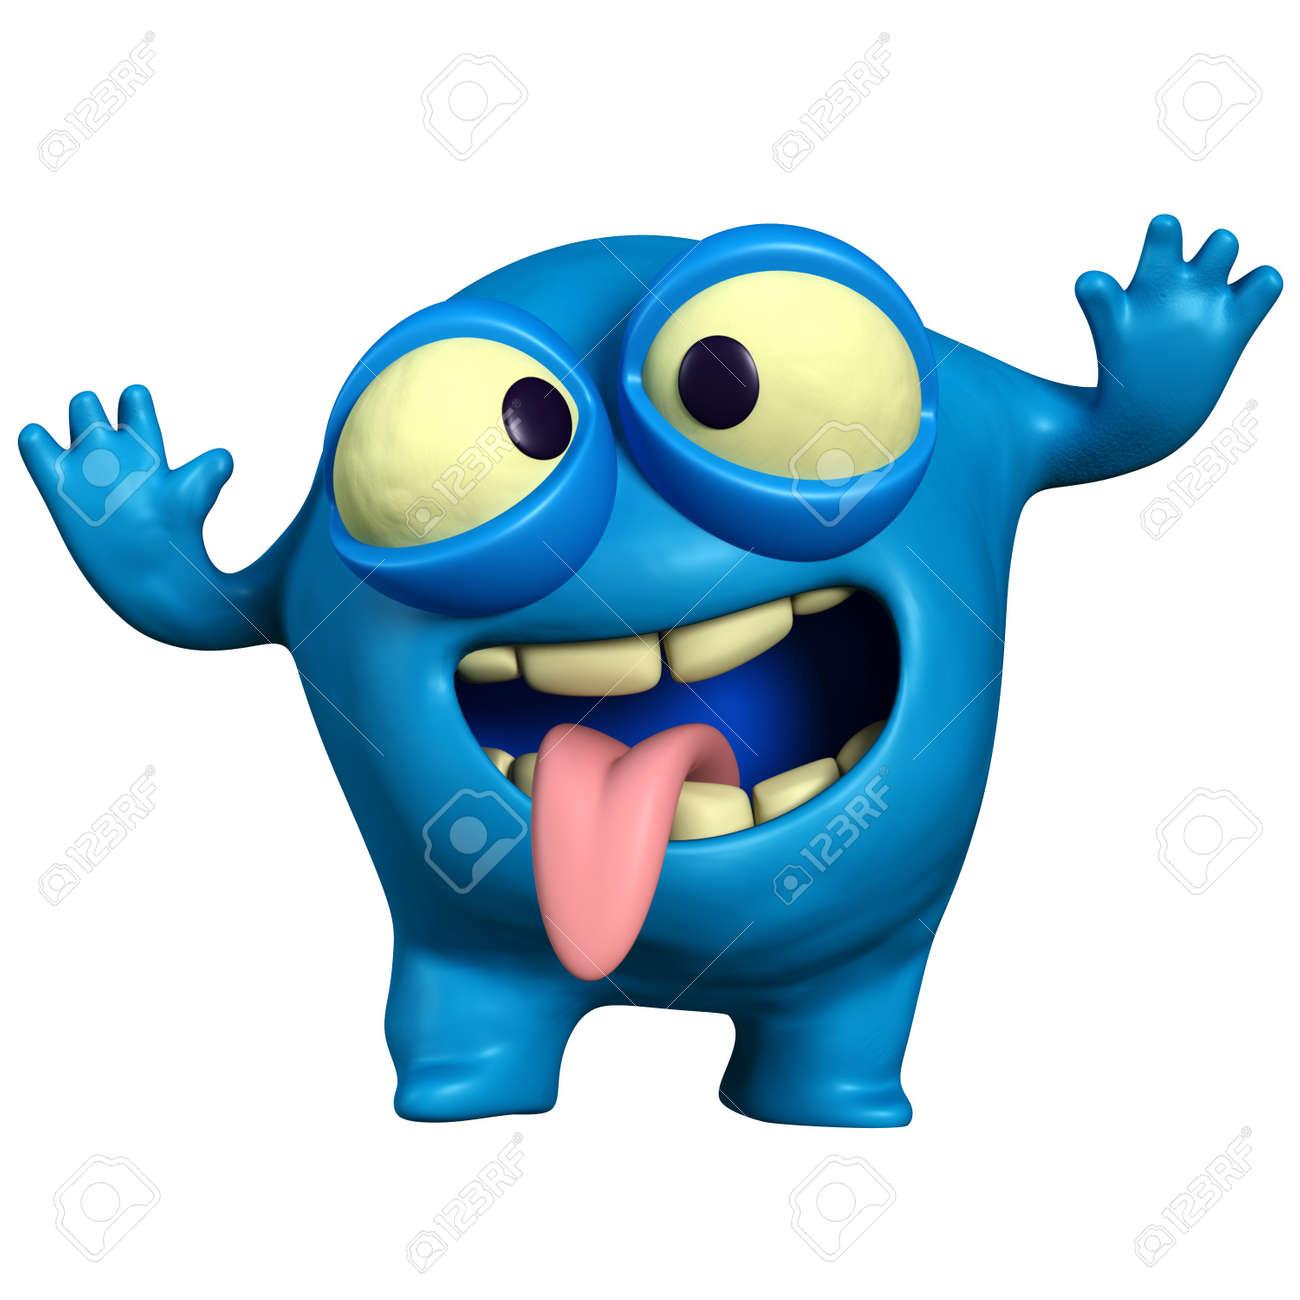 cartoon crazy blue monster Stock Photo - 15732026